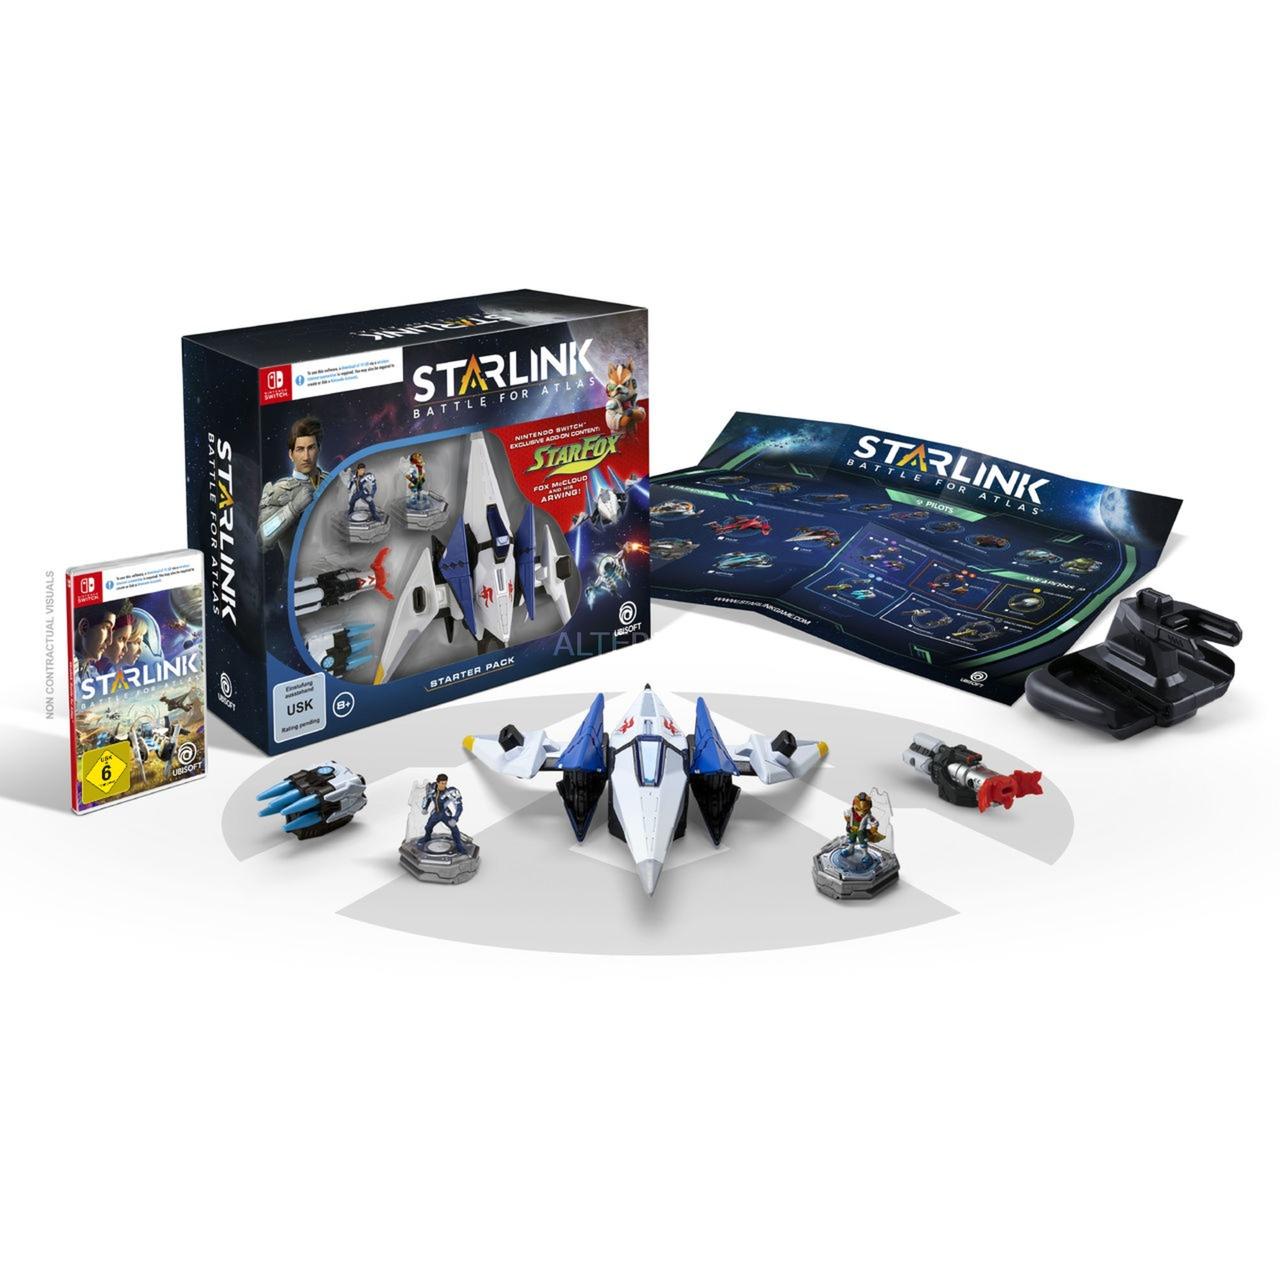 Starlink: Battle for Atlas - Starter Pack, Juego